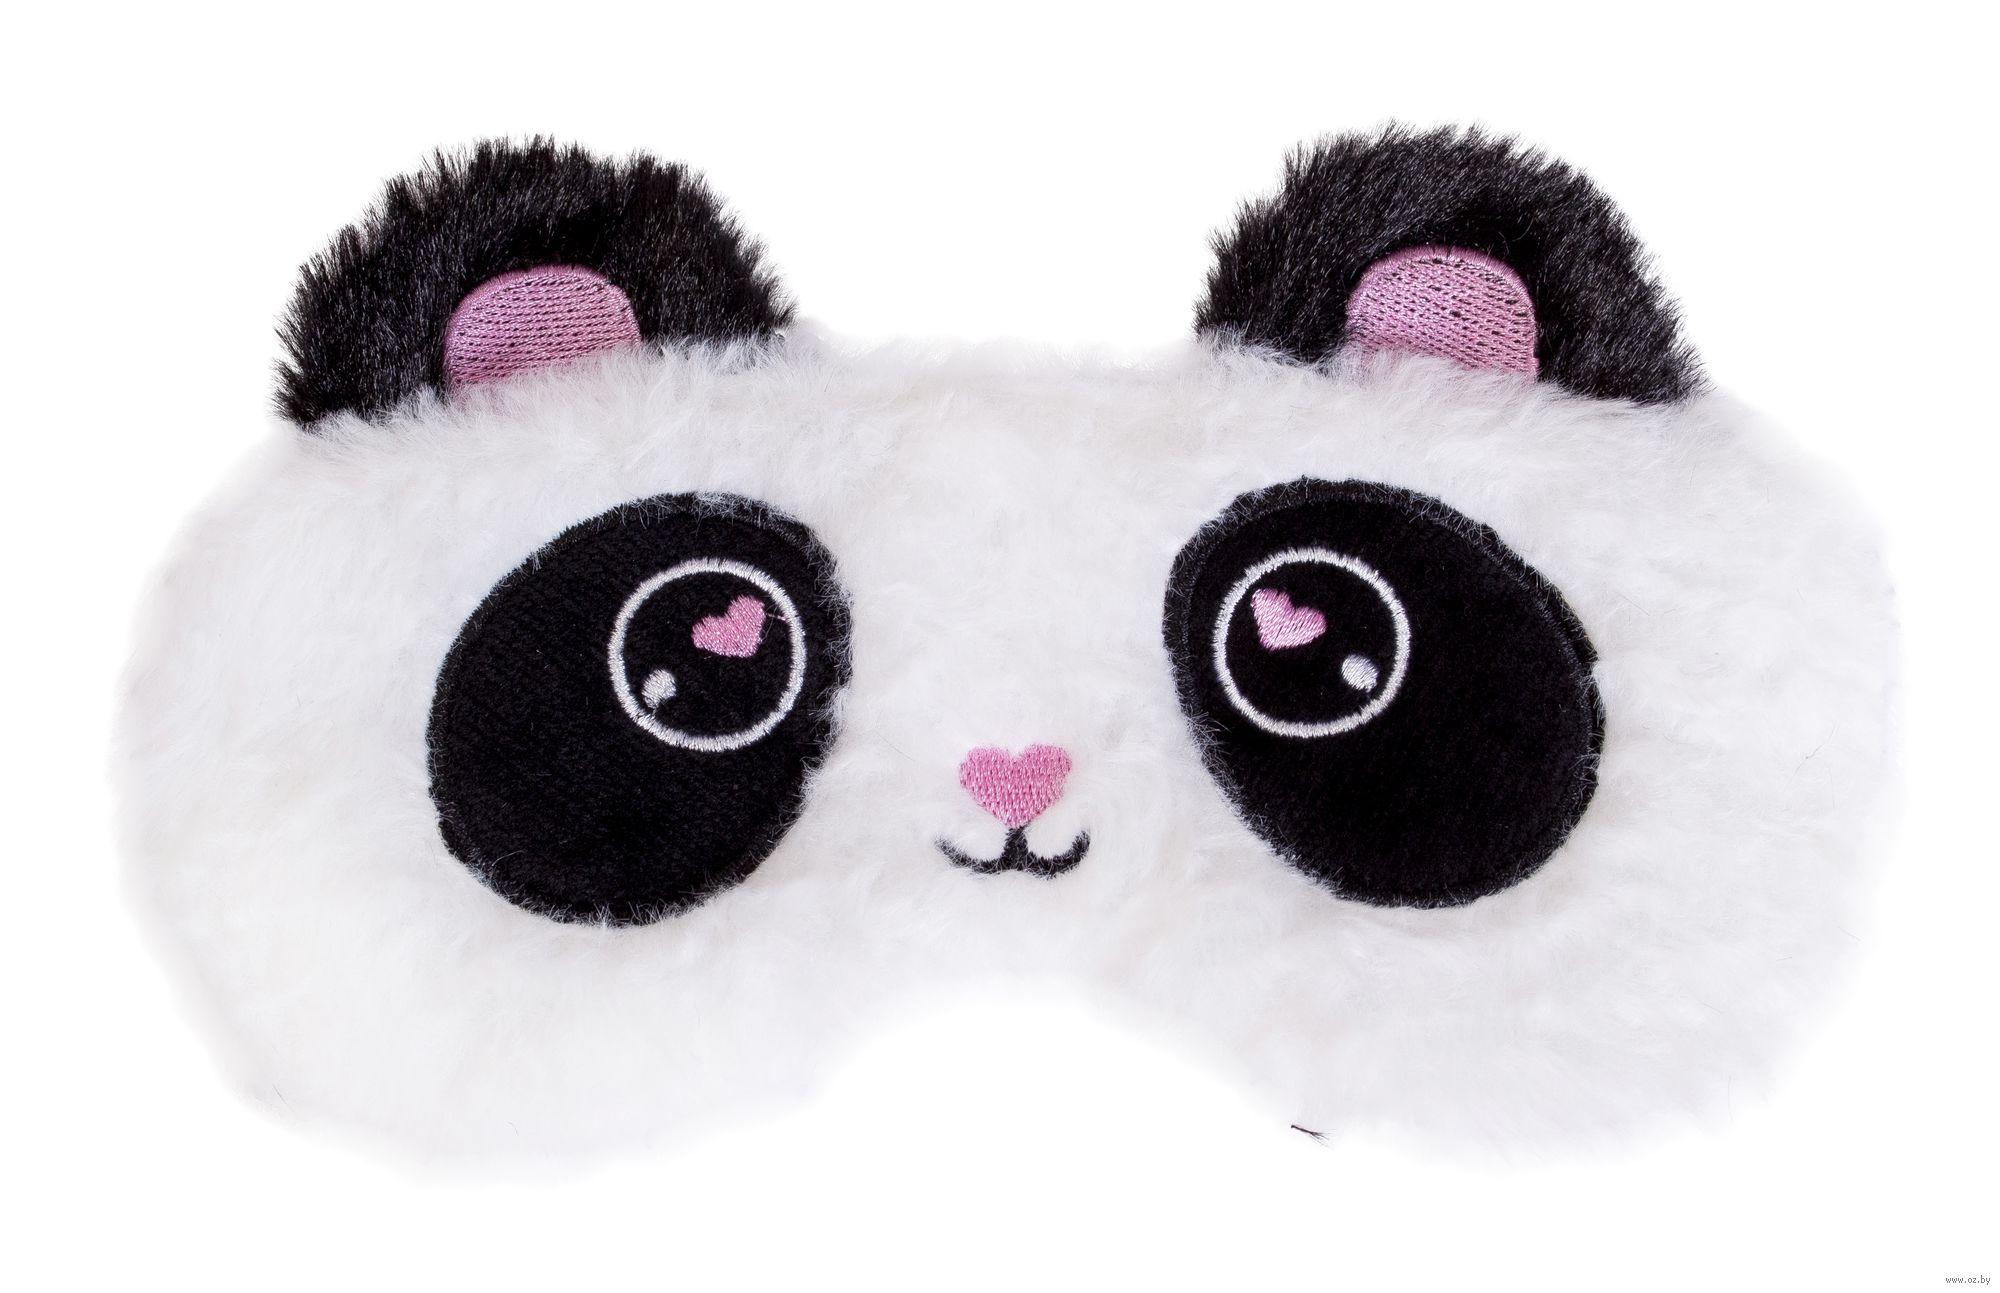 маска для сна панда картинки его